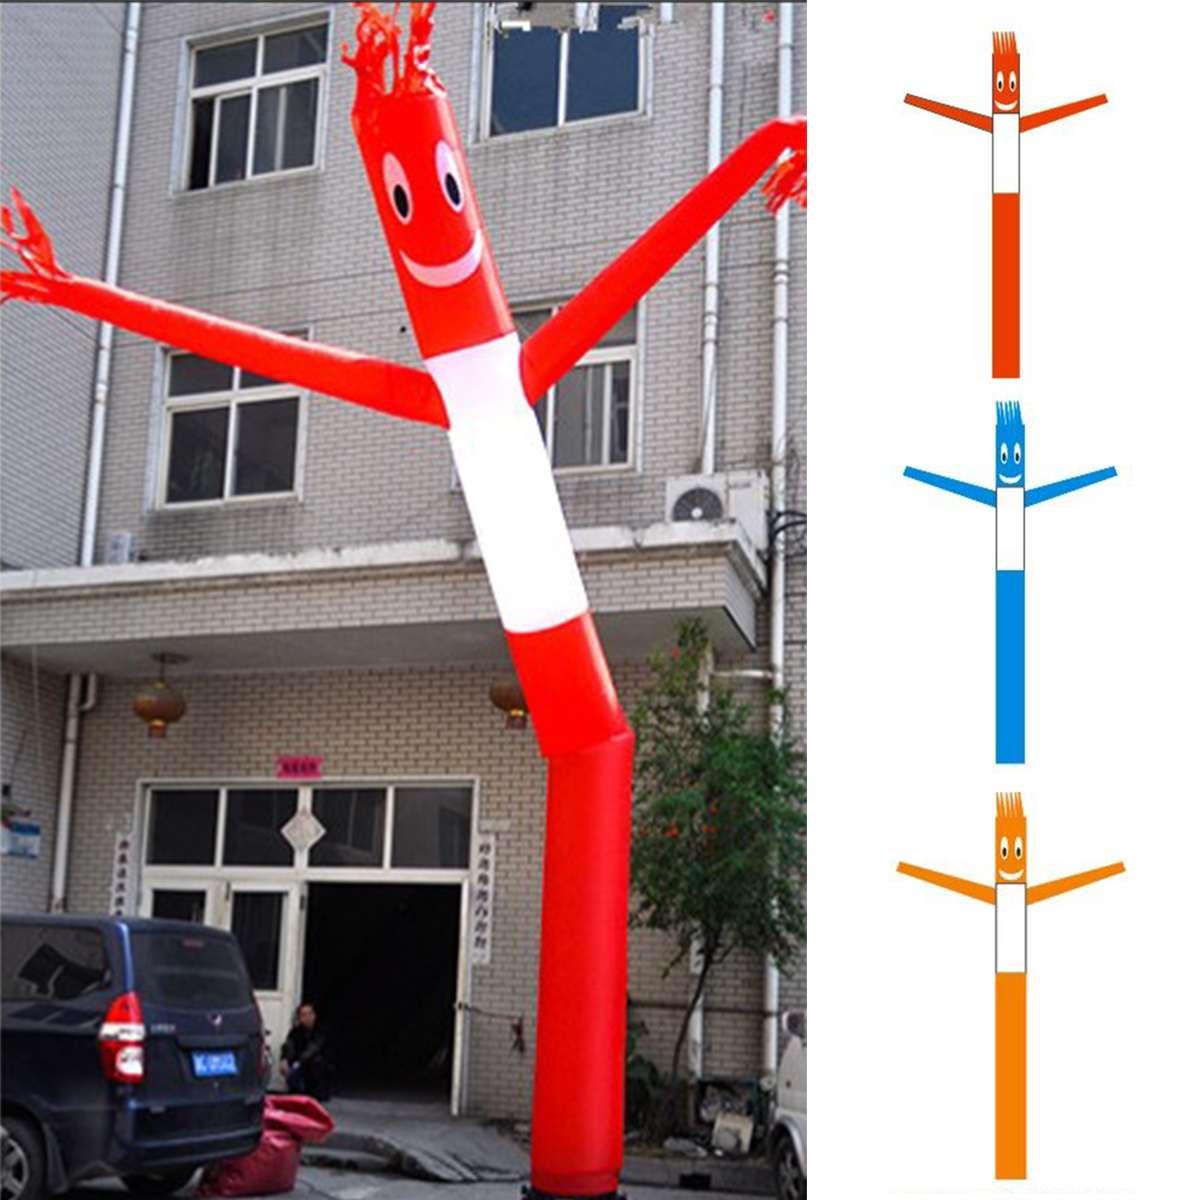 3m/6m Inflatable Advertising Air Sky Human Dancers Tube Puppet Flag Wavy Man Wind Dancers Carton Advertsing Dancing Model Toy